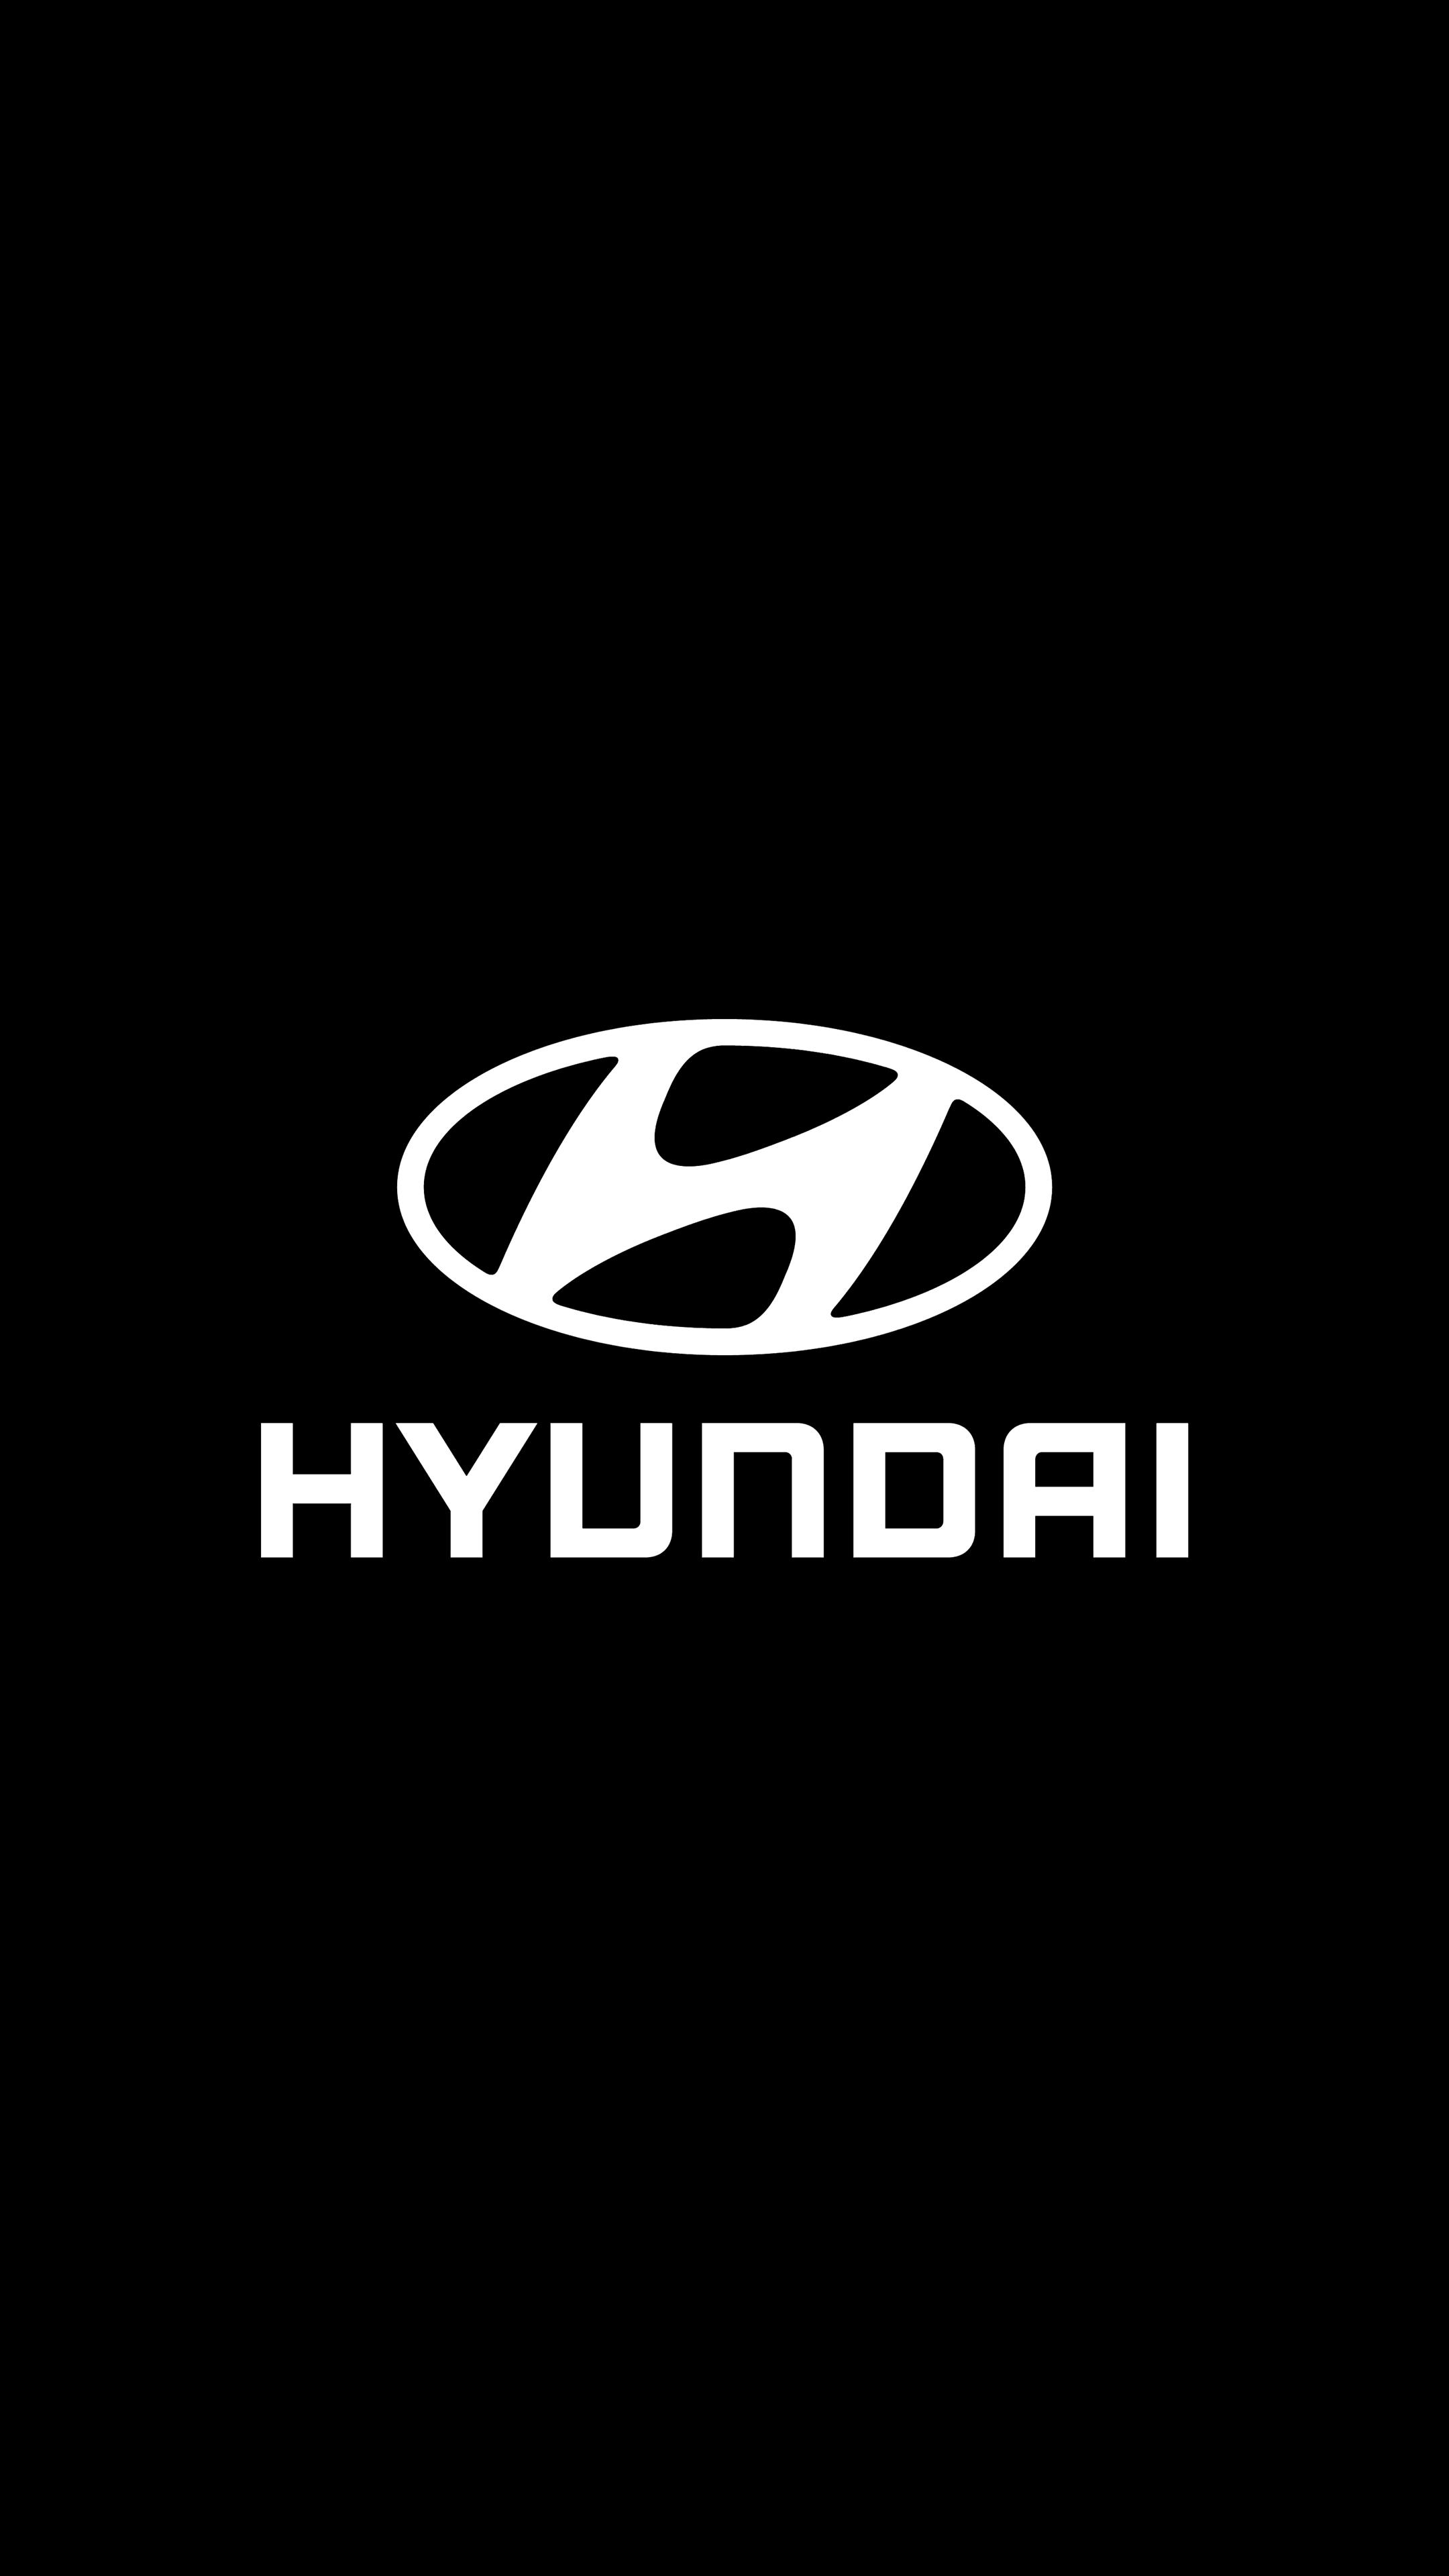 Pin By Andries Van On Gemotoriseerde Fiets Hyundai Logo Graphic Design Ads Car Logos